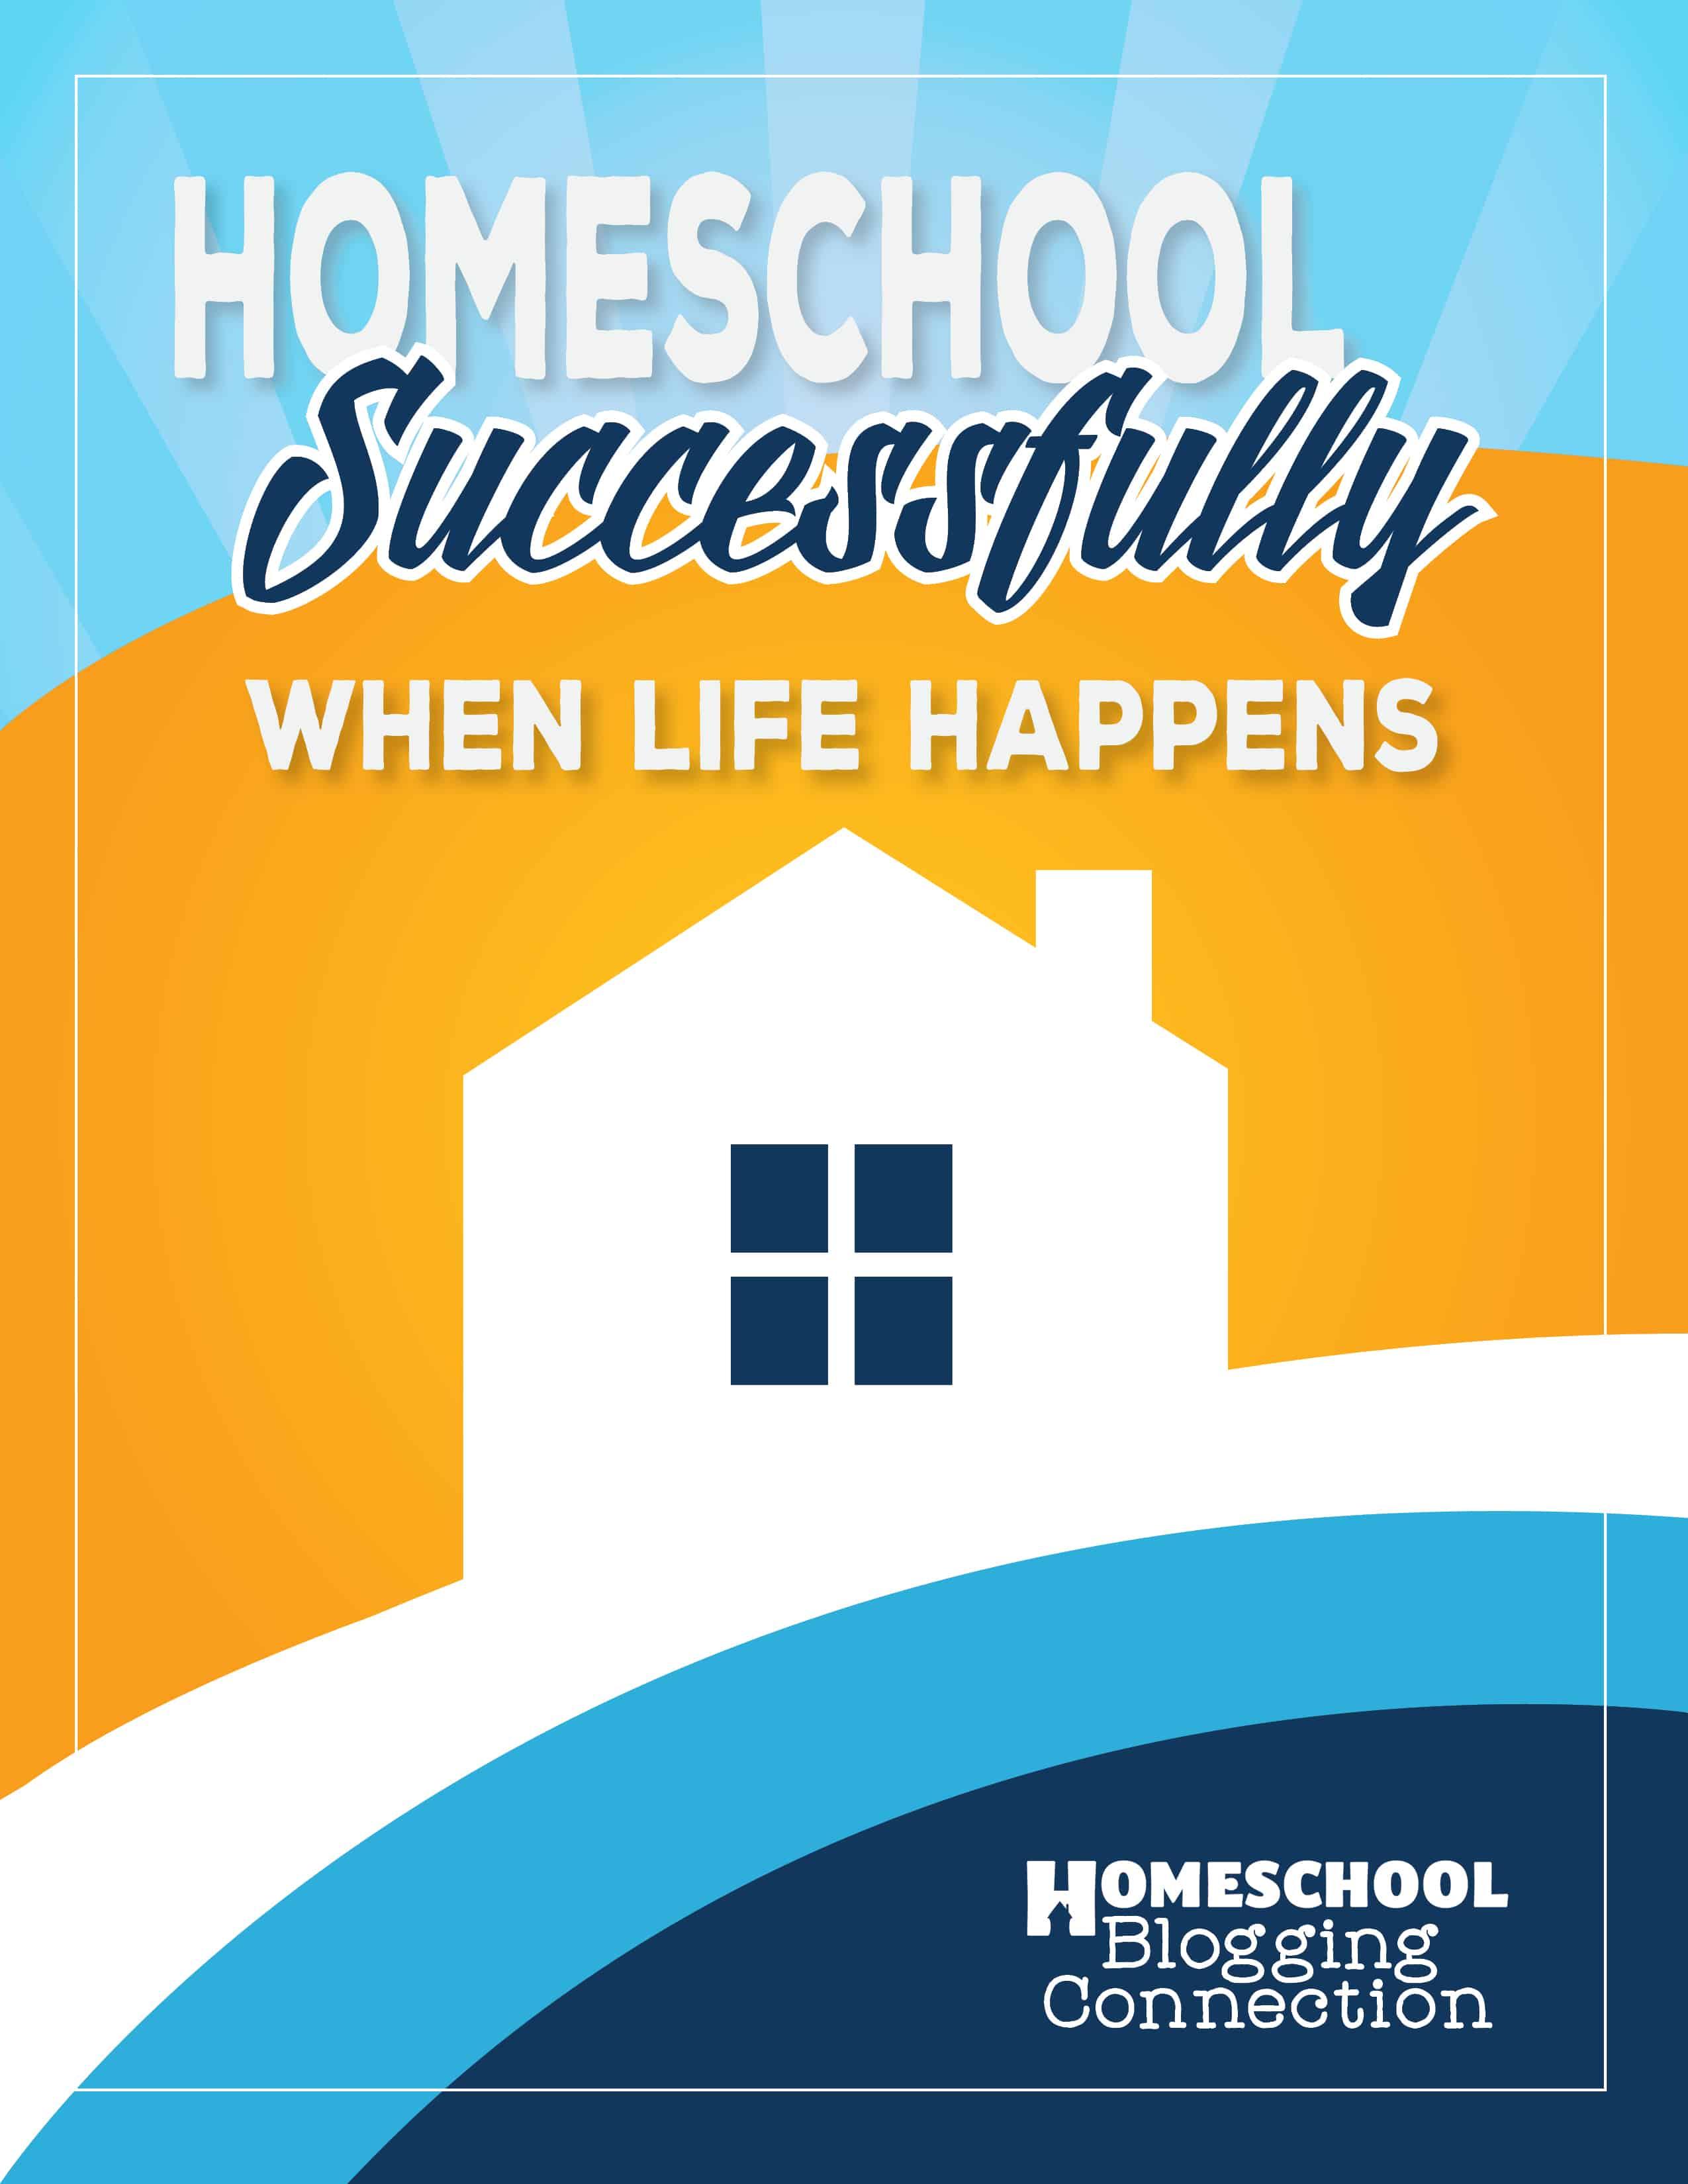 Homeschool Successfully When Life Happens